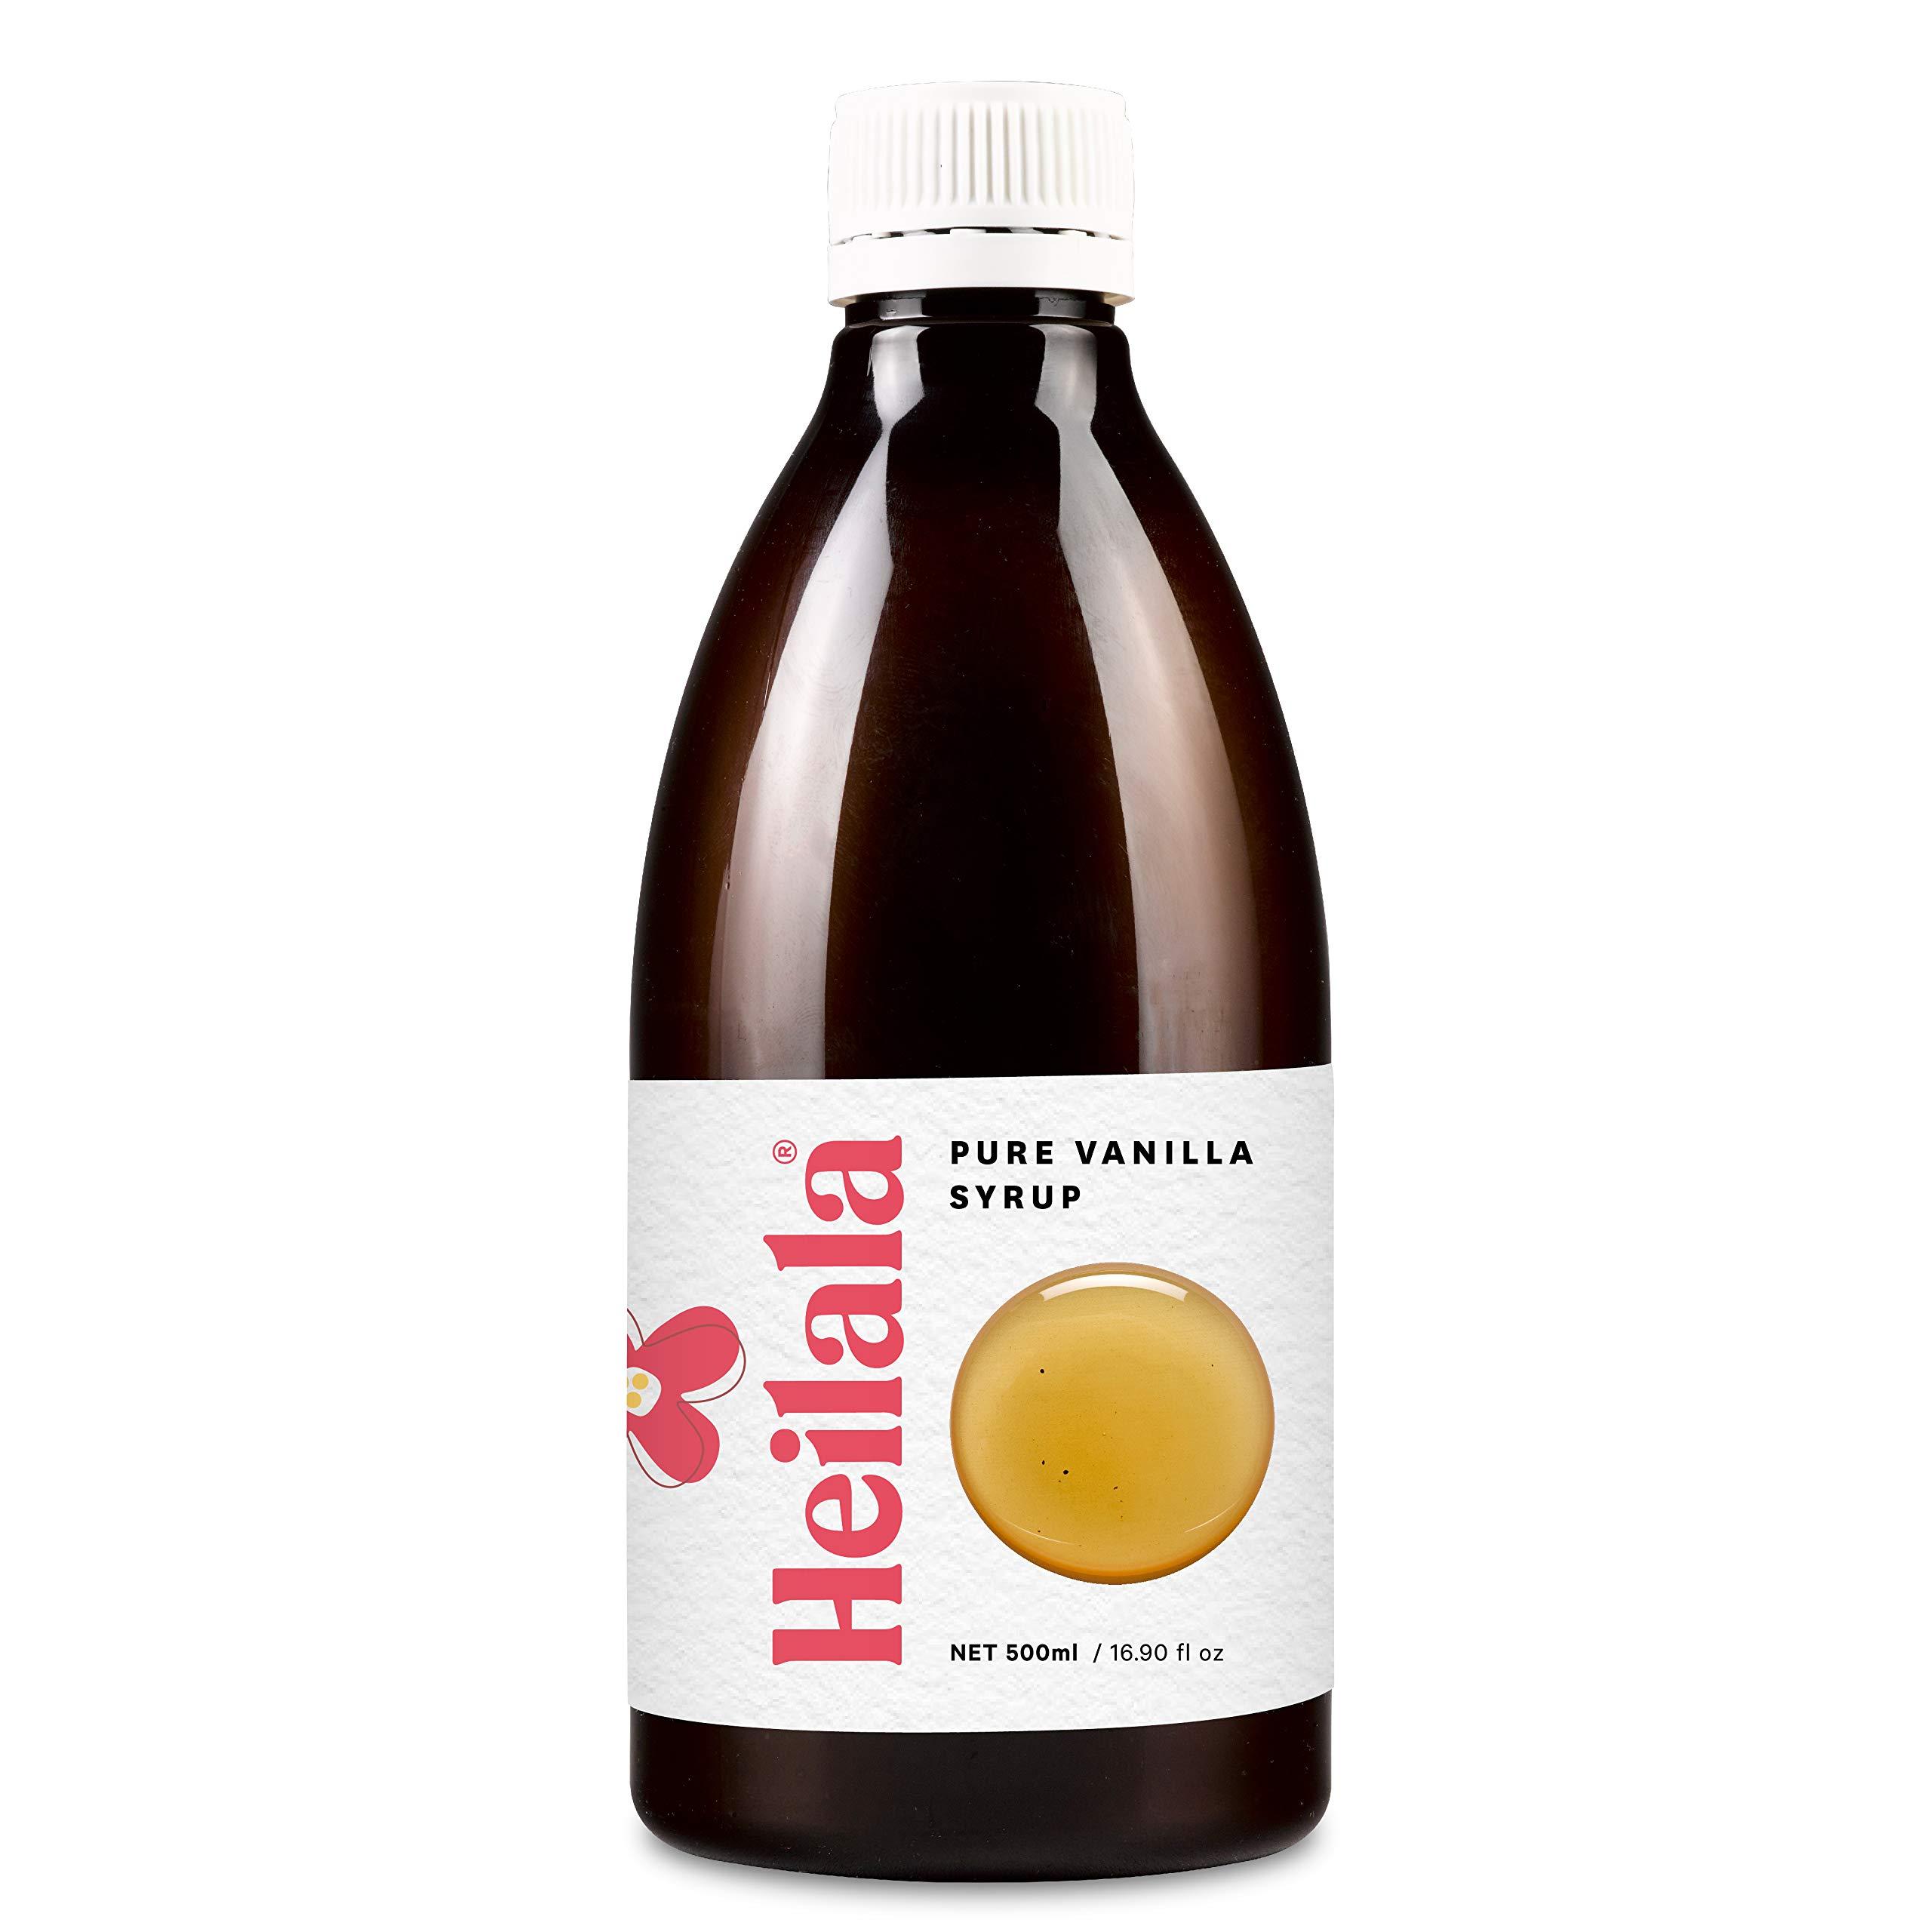 Heilala Vanilla Syrup - Premium Vanilla Bean Syrup Flavoring for Coffee, Cocktails, Pancakes, Ice Cream, 16.90 fl oz